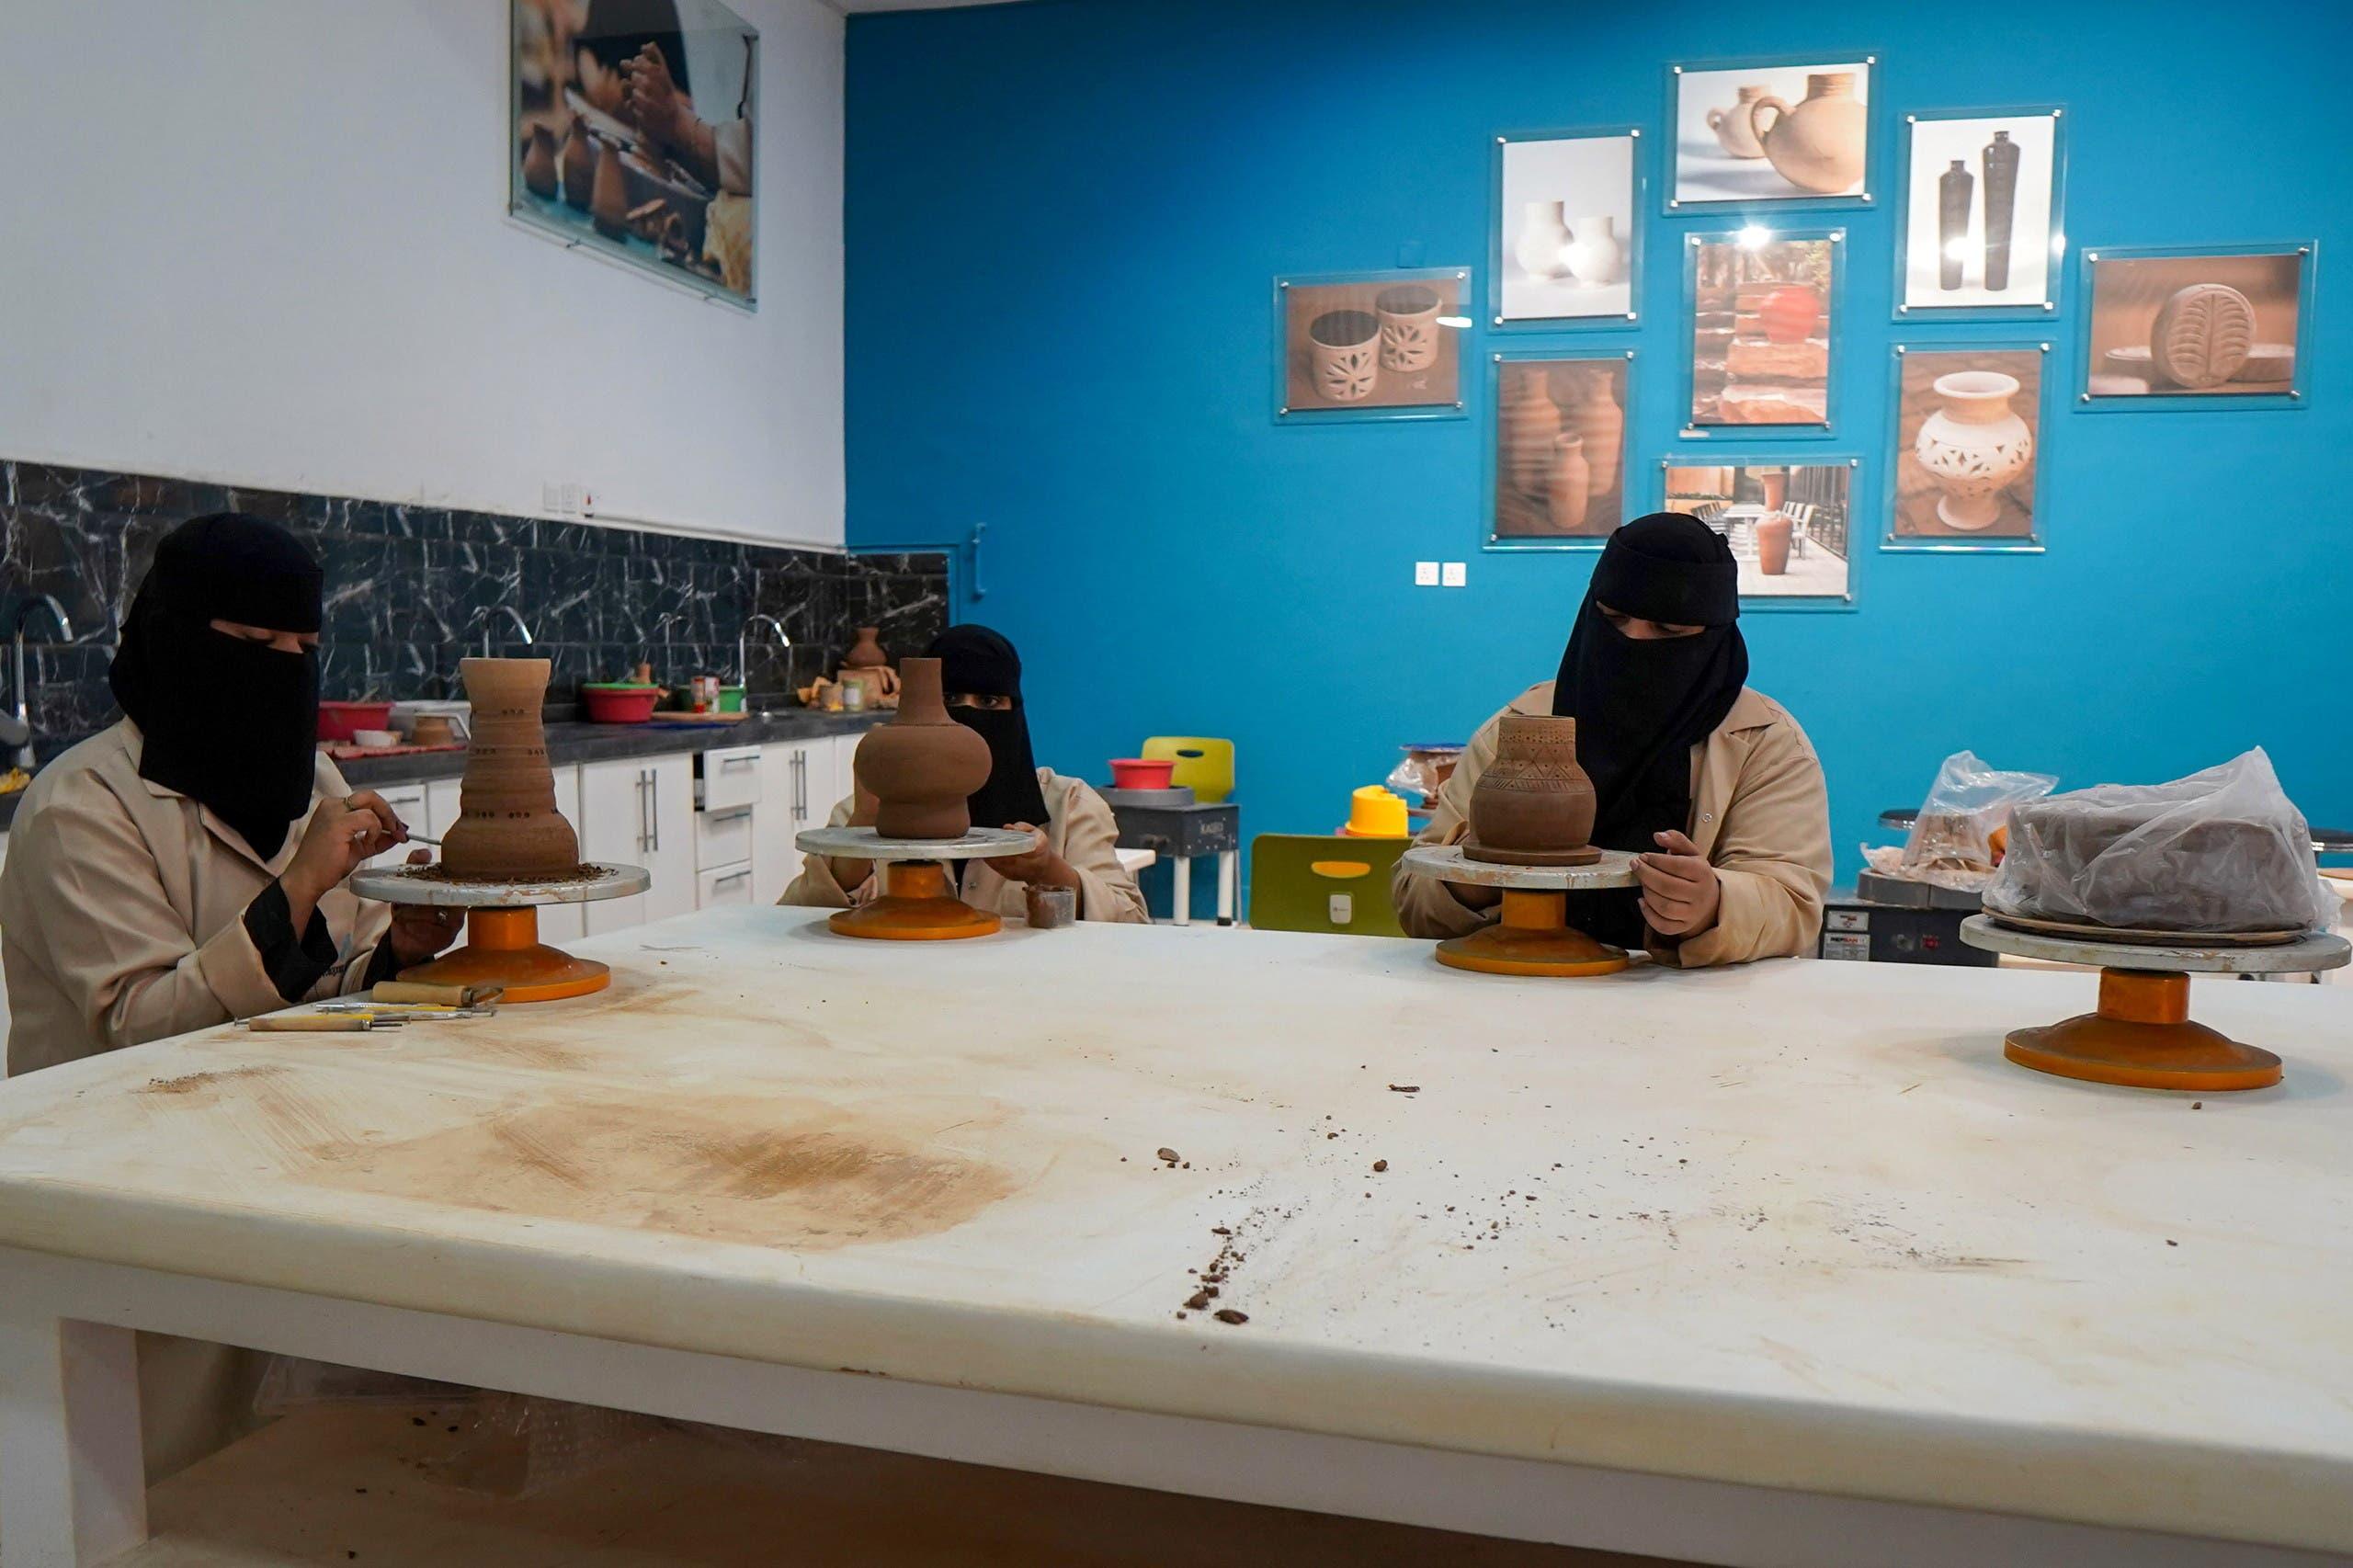 Saudi women work on pots in a workshop in AlUla, Saudi Arabia, April 8, 2021. Picture taken April 8, 2021. (Reuters)